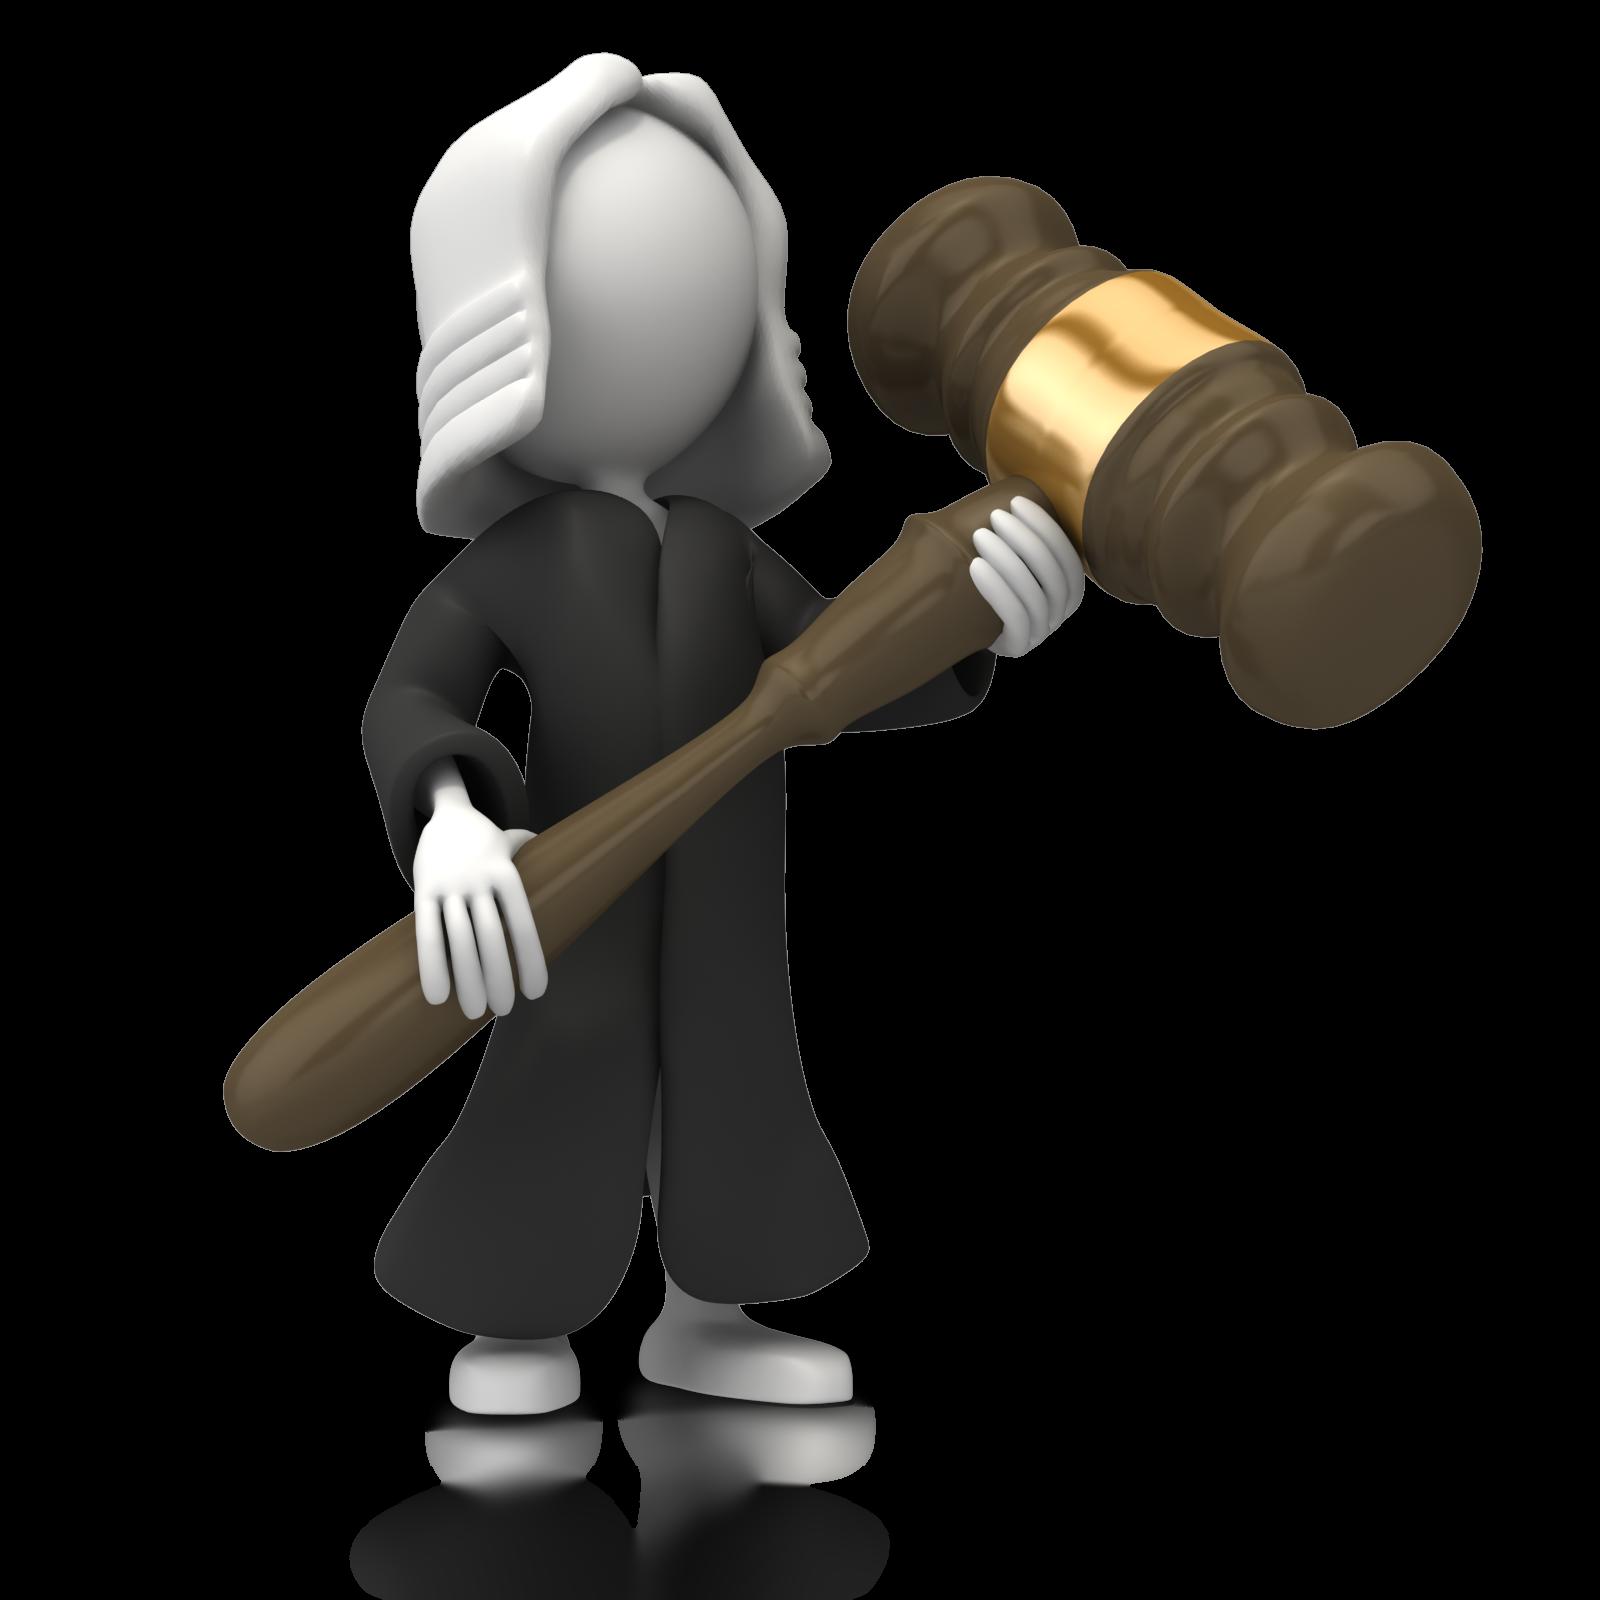 http://lawyermarketingtips.com/wp-content/uploads/2012/03 ...